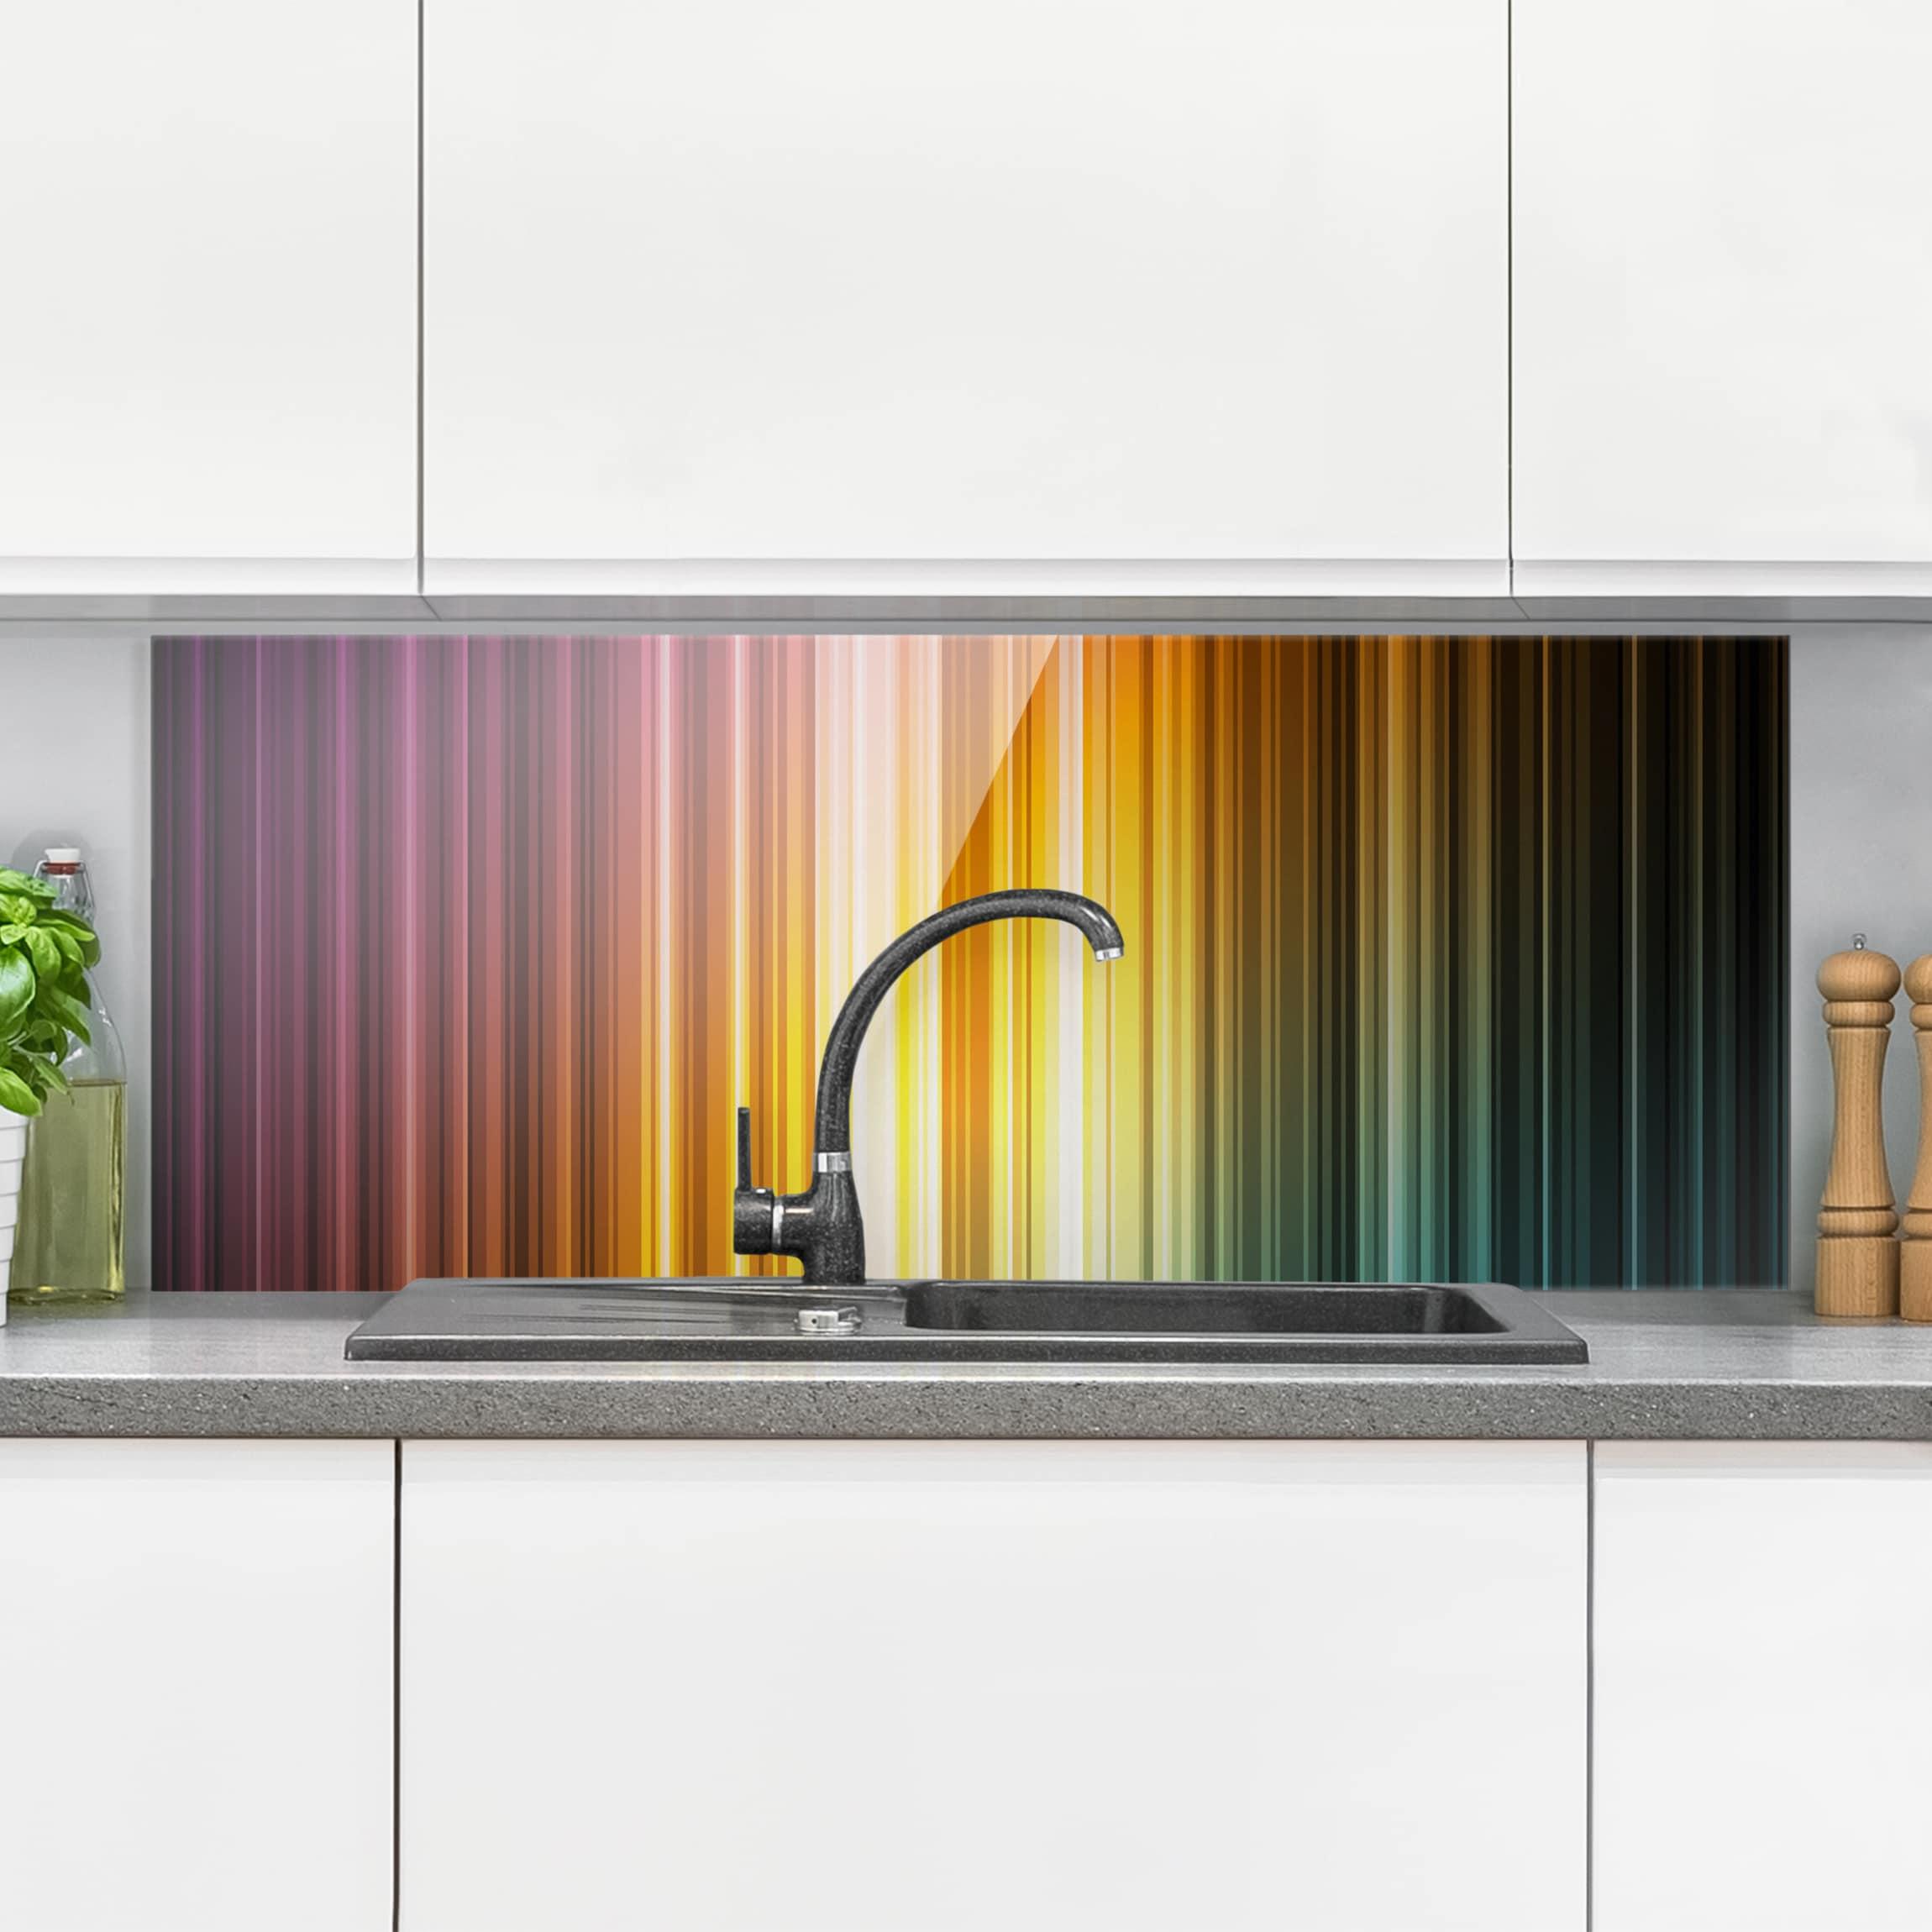 Spritzschutz glas rainbow light panorama quer for Spritzschutz glas